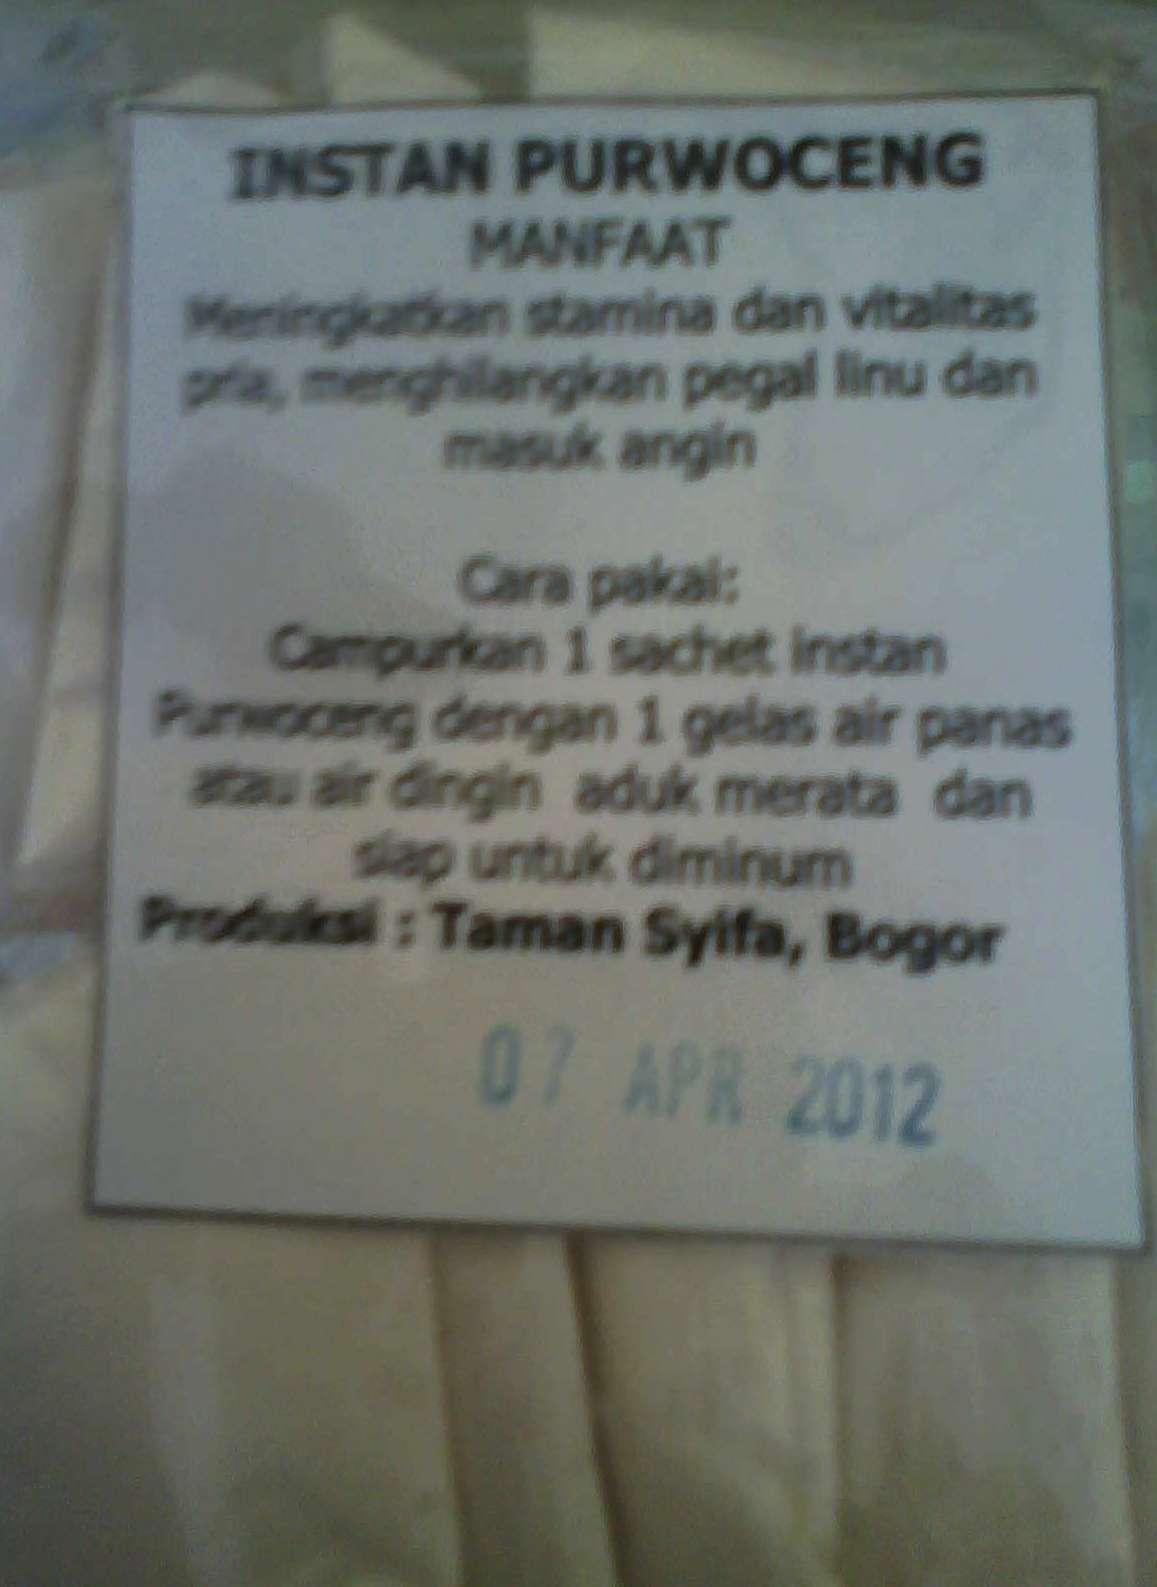 Effect of viagra on blood sugar